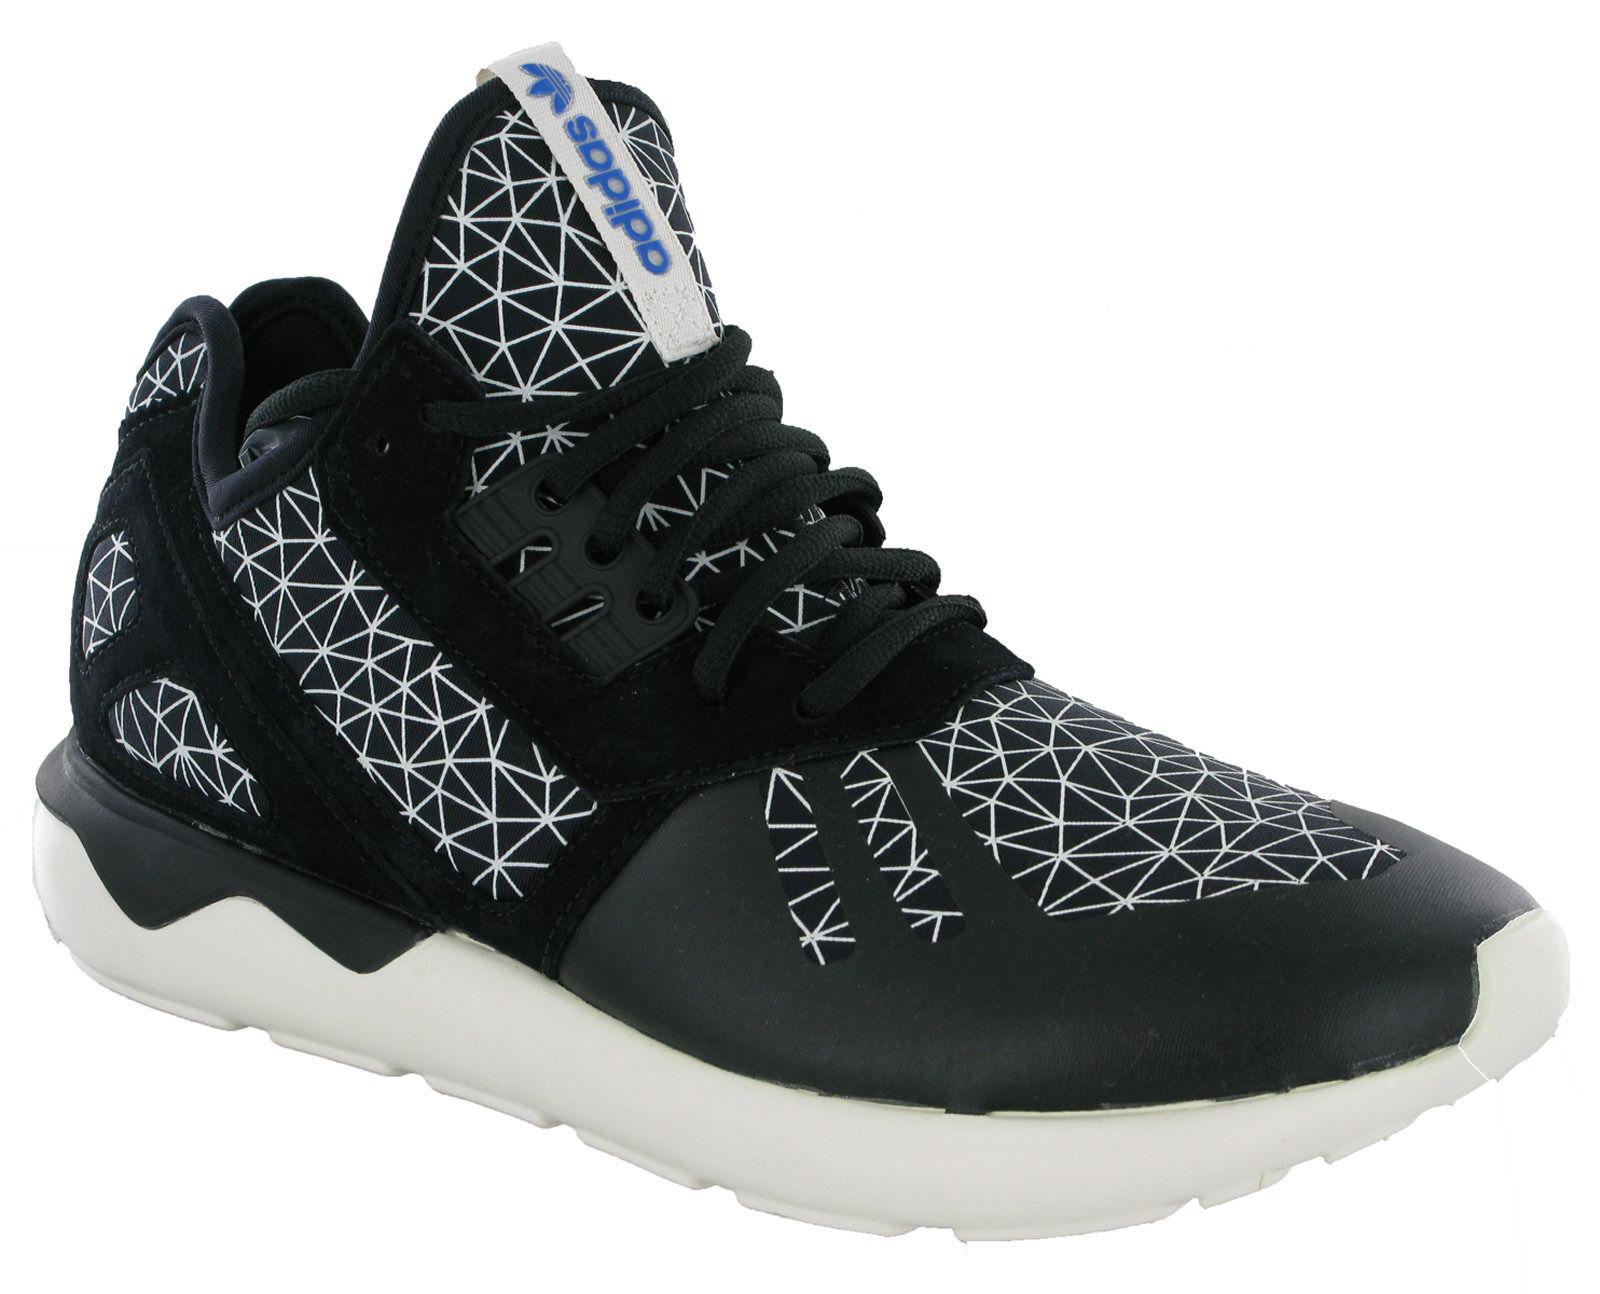 Adidas Tubular Runner Trainers Mens Neoprene Sports Running Lace-up Black UK8-11